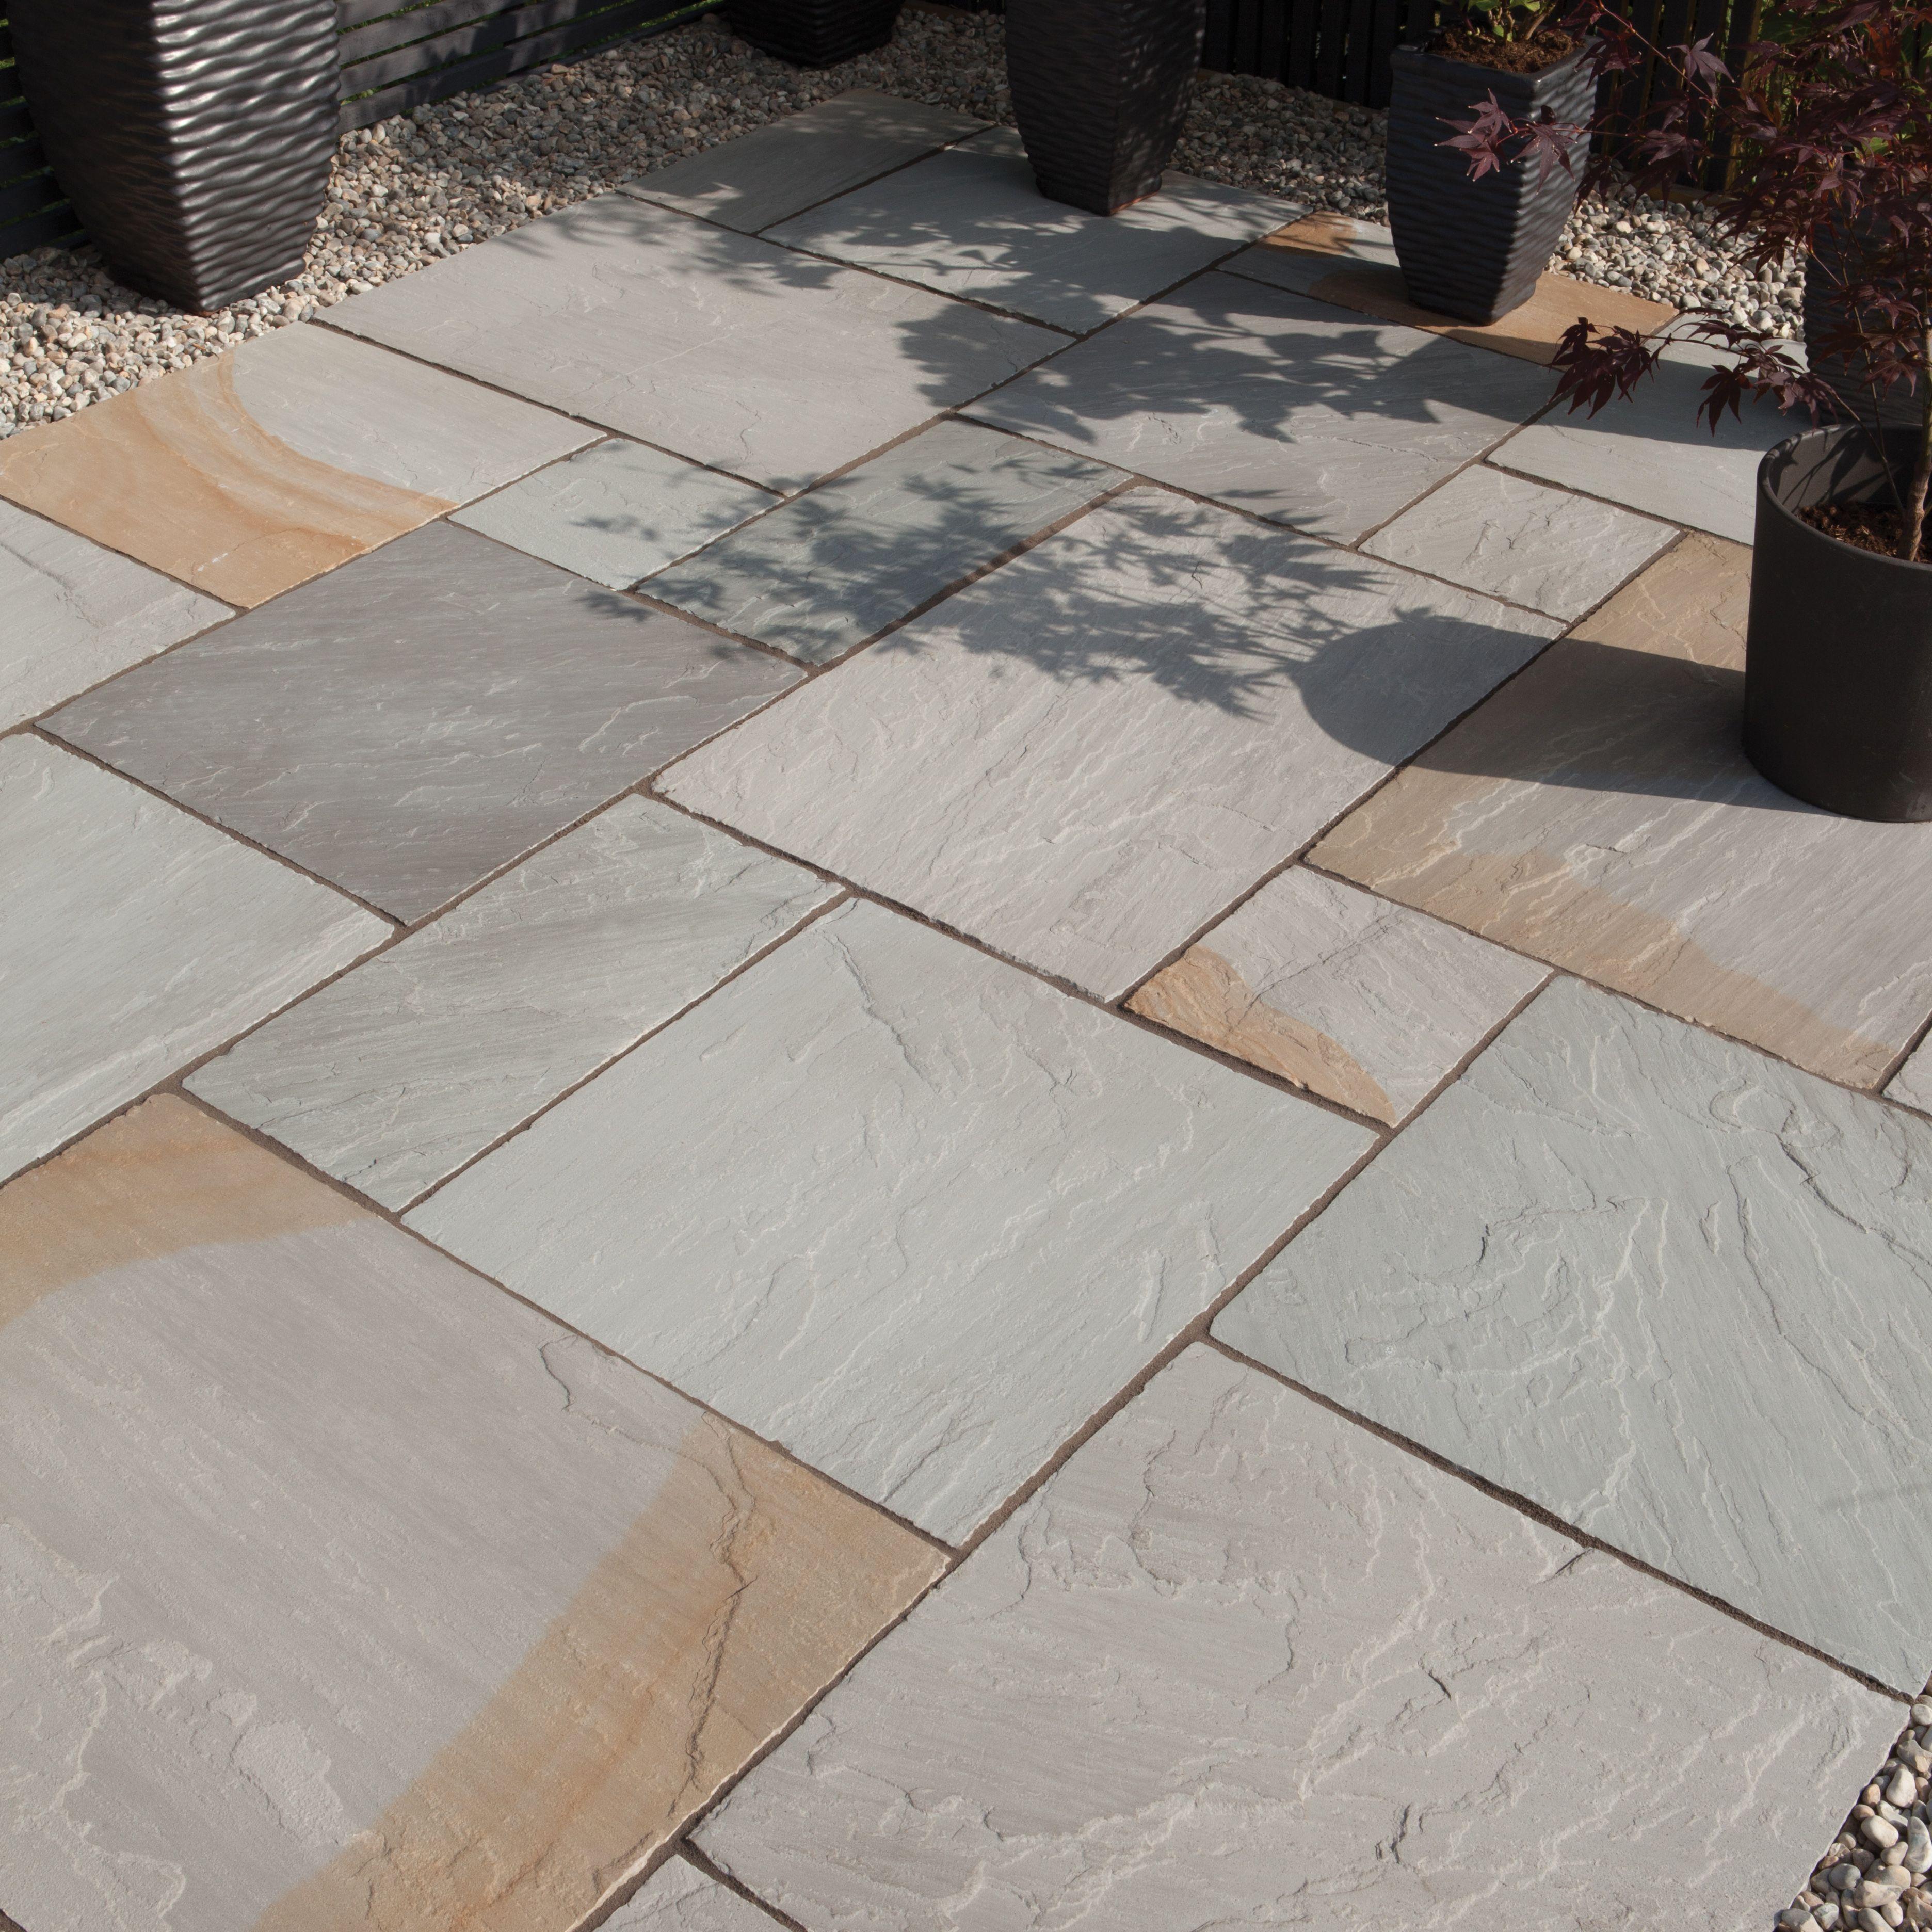 Natural Travertine Mosaic Tile L 300mm W 300mm: BRADSTONE Grey Blend Natural Sandstone Single Paving Slab